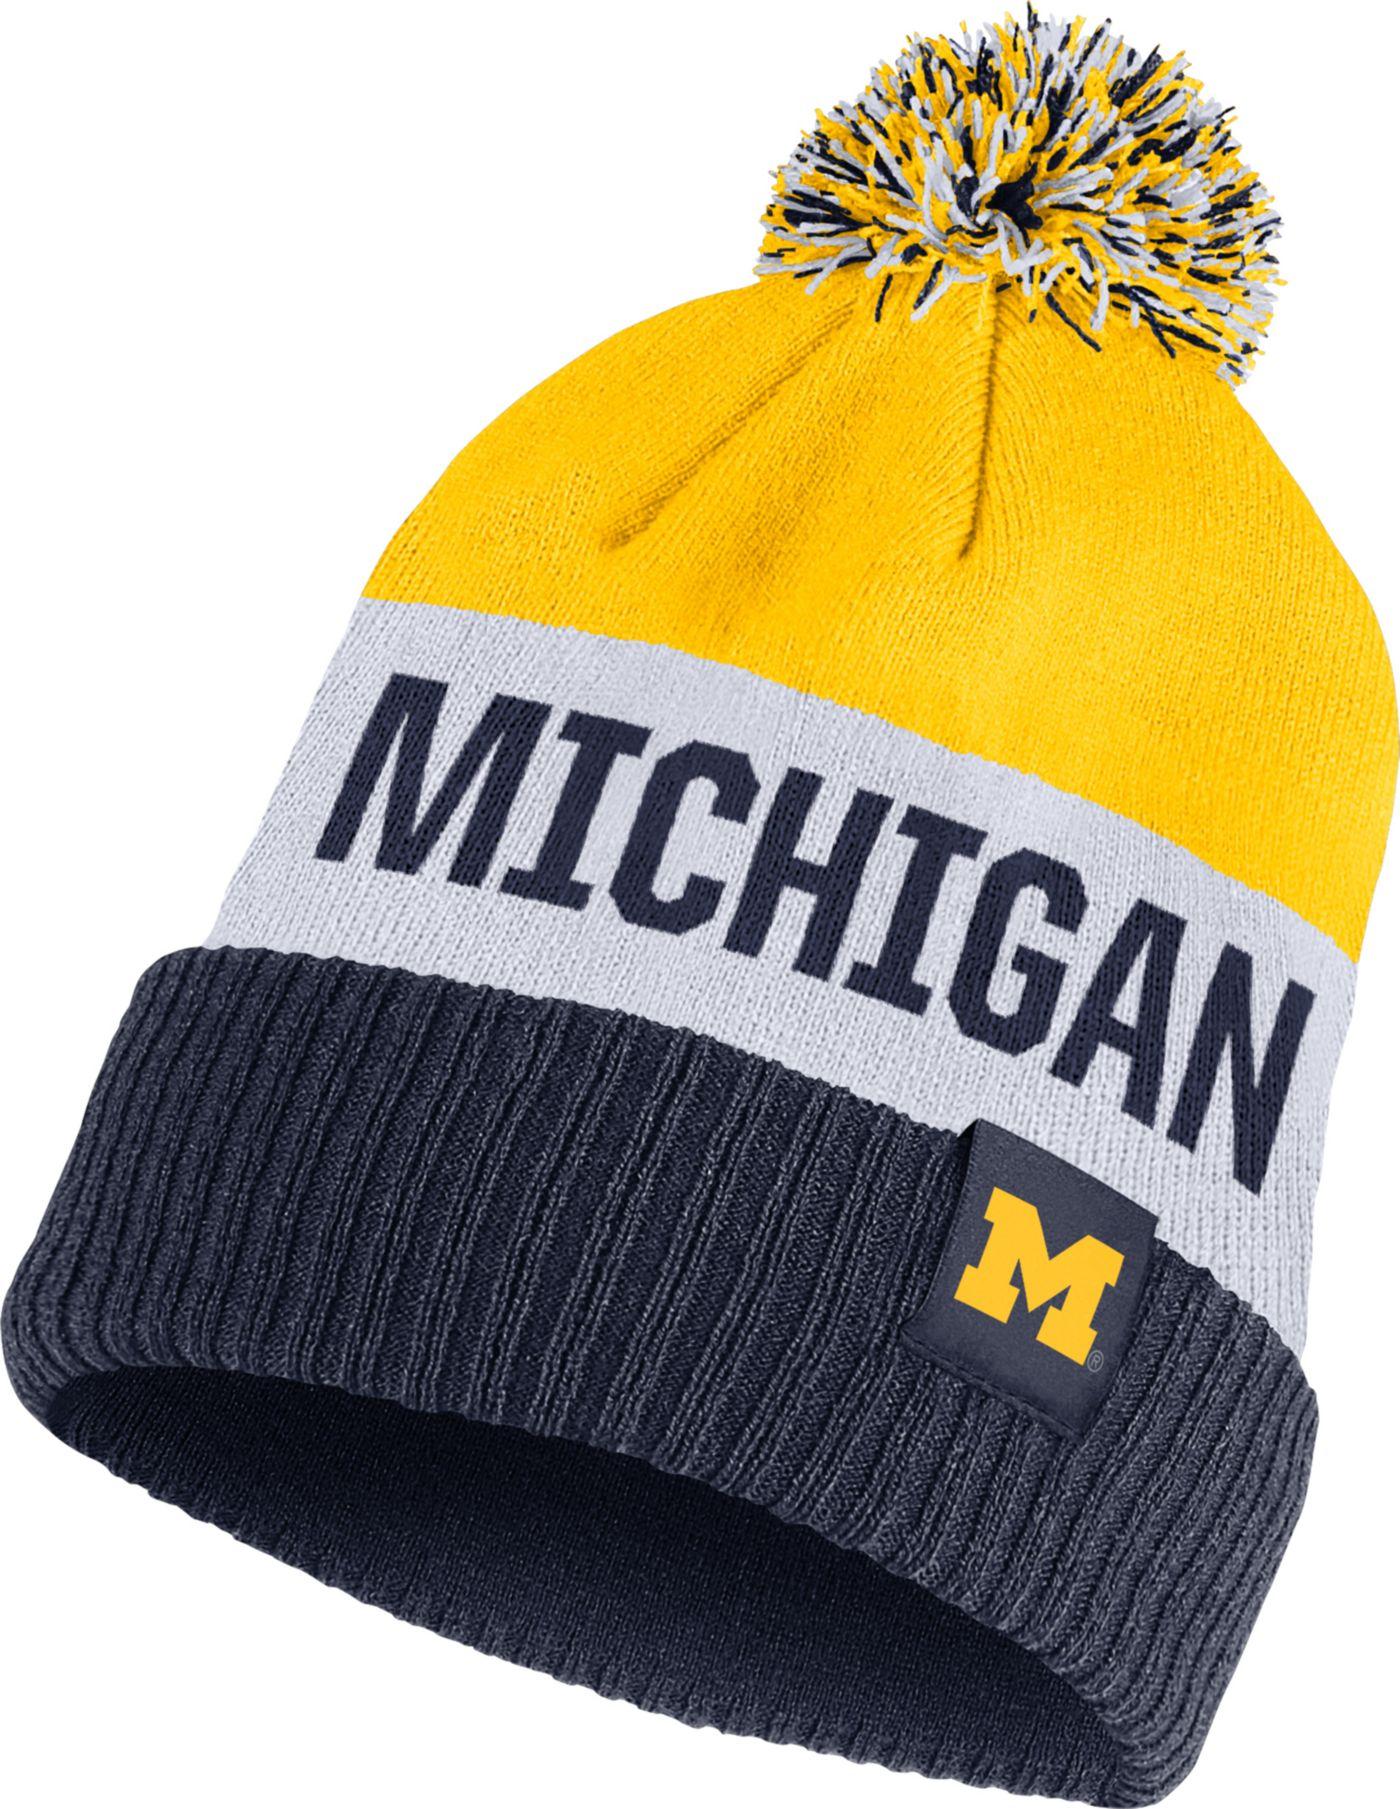 Nike Men's Michigan Wolverines Maize/White/Blue Striped Cuffed Pom Beanie